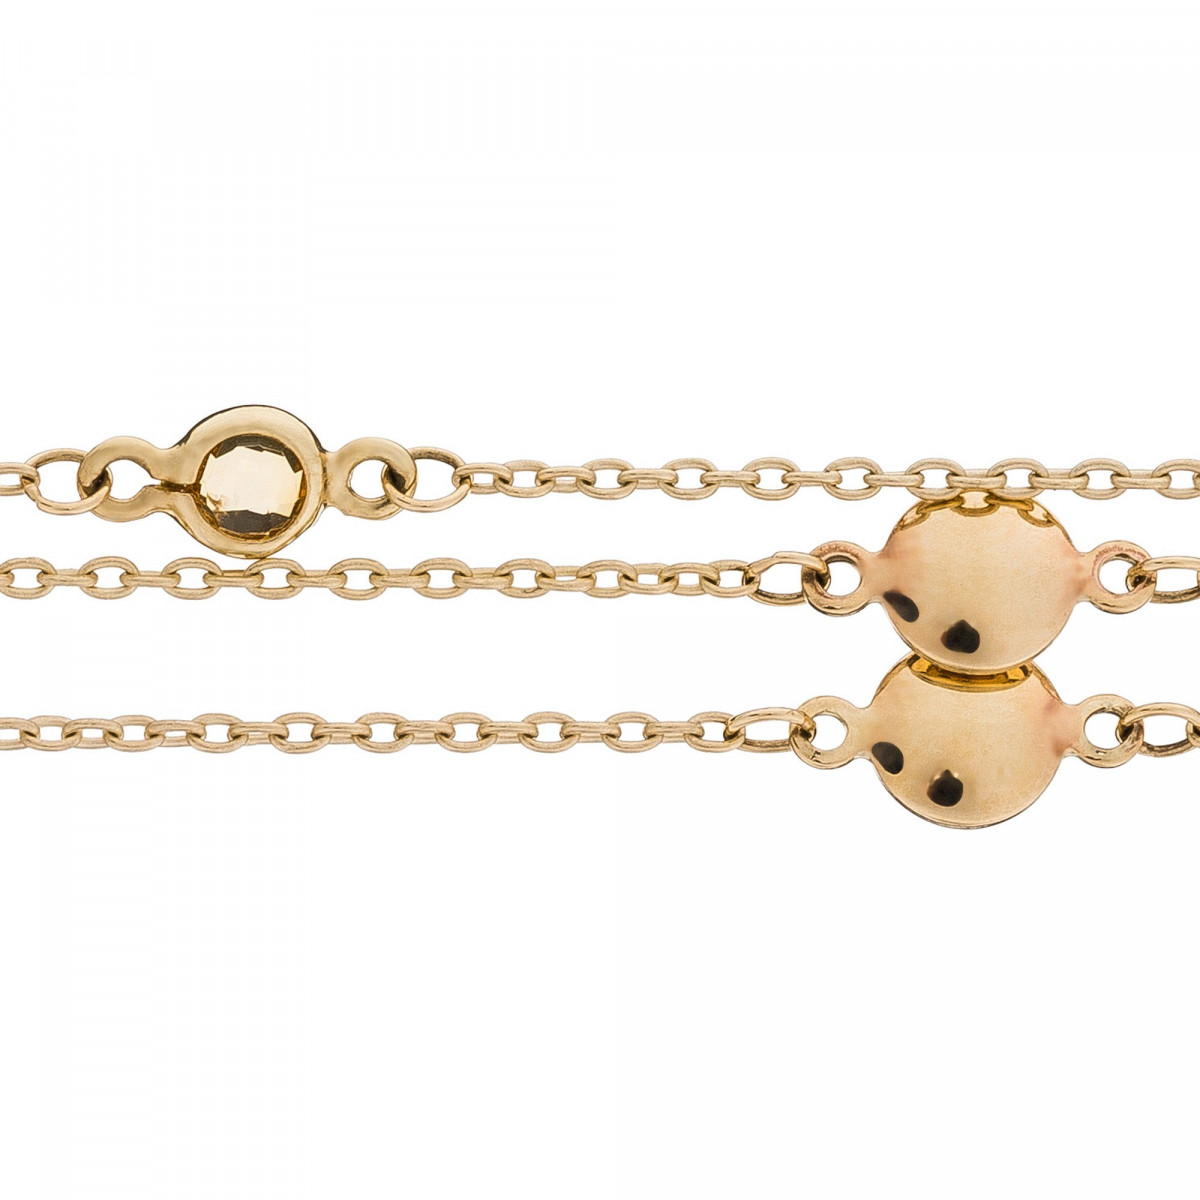 "Bracelet chaine or jaune et oxydes de zirconium ""Mélodie"""